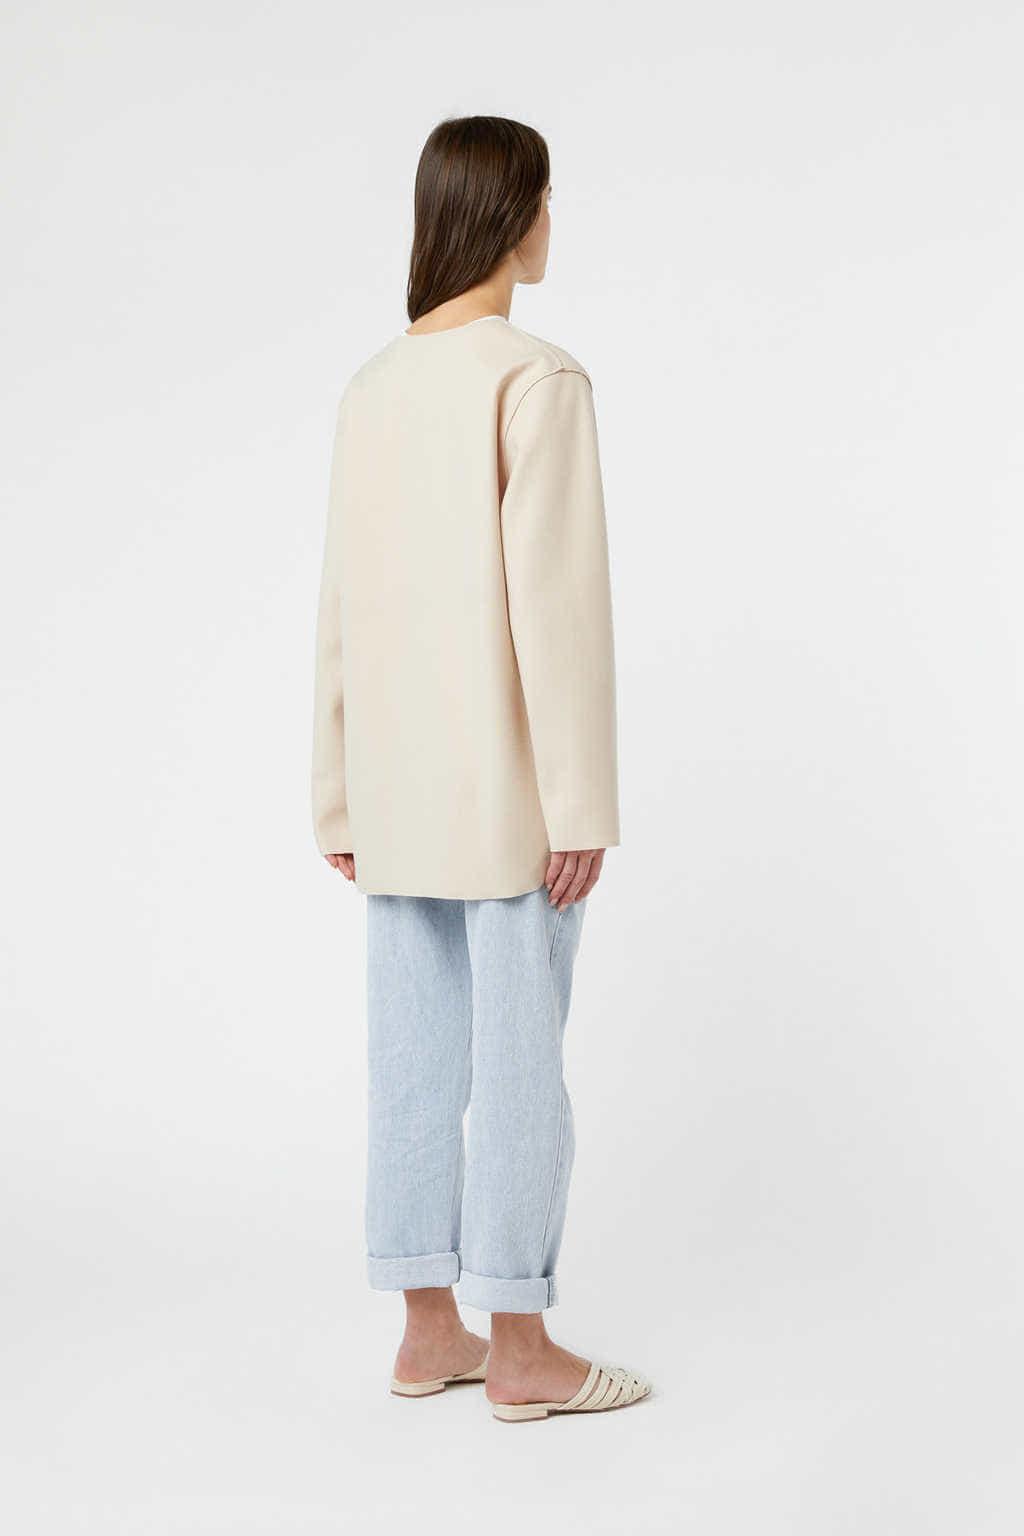 Jacket J009 Cream 4